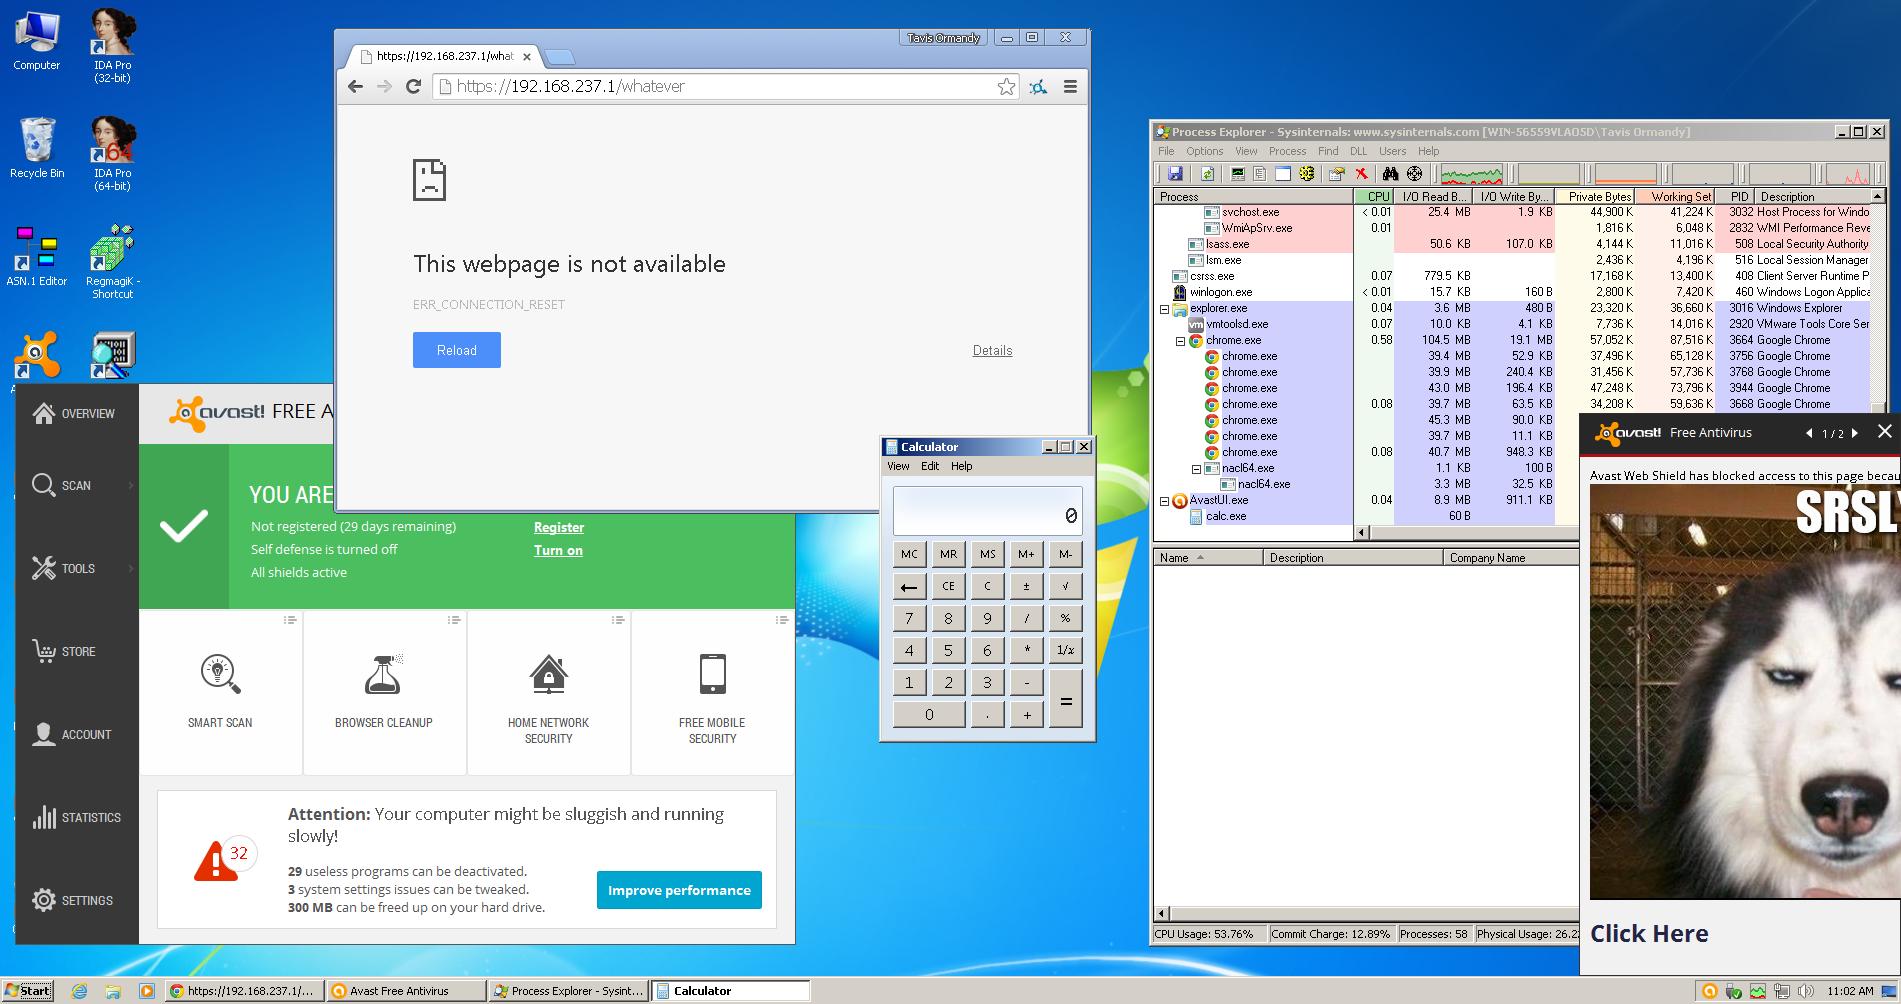 Avast Antivirus: X.509 Error Rendering Command Execution 1